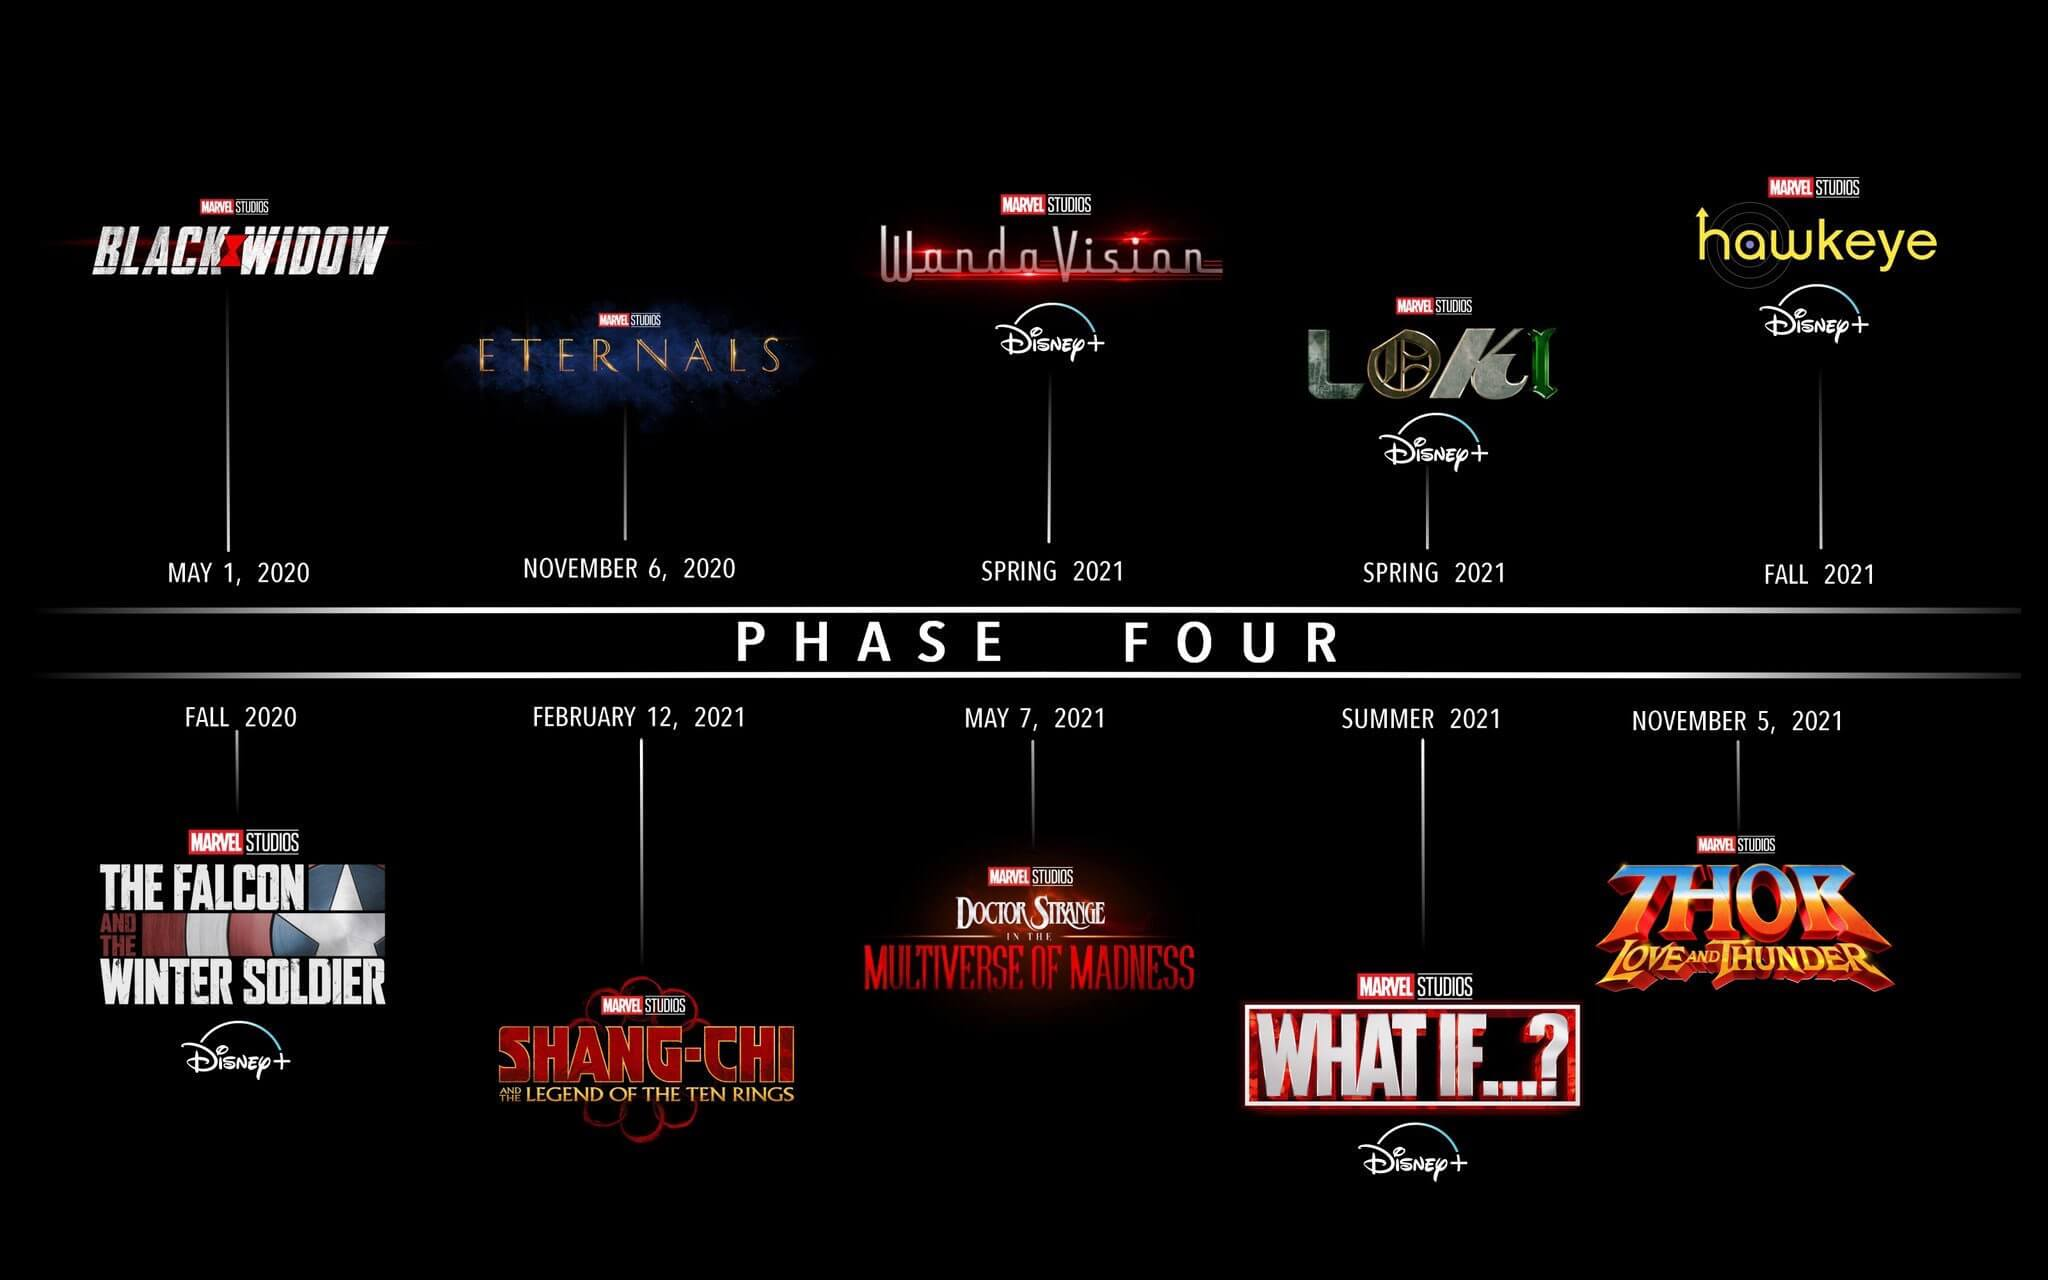 Marvel Studios Announces Phase 4 Line-Up, New Casting